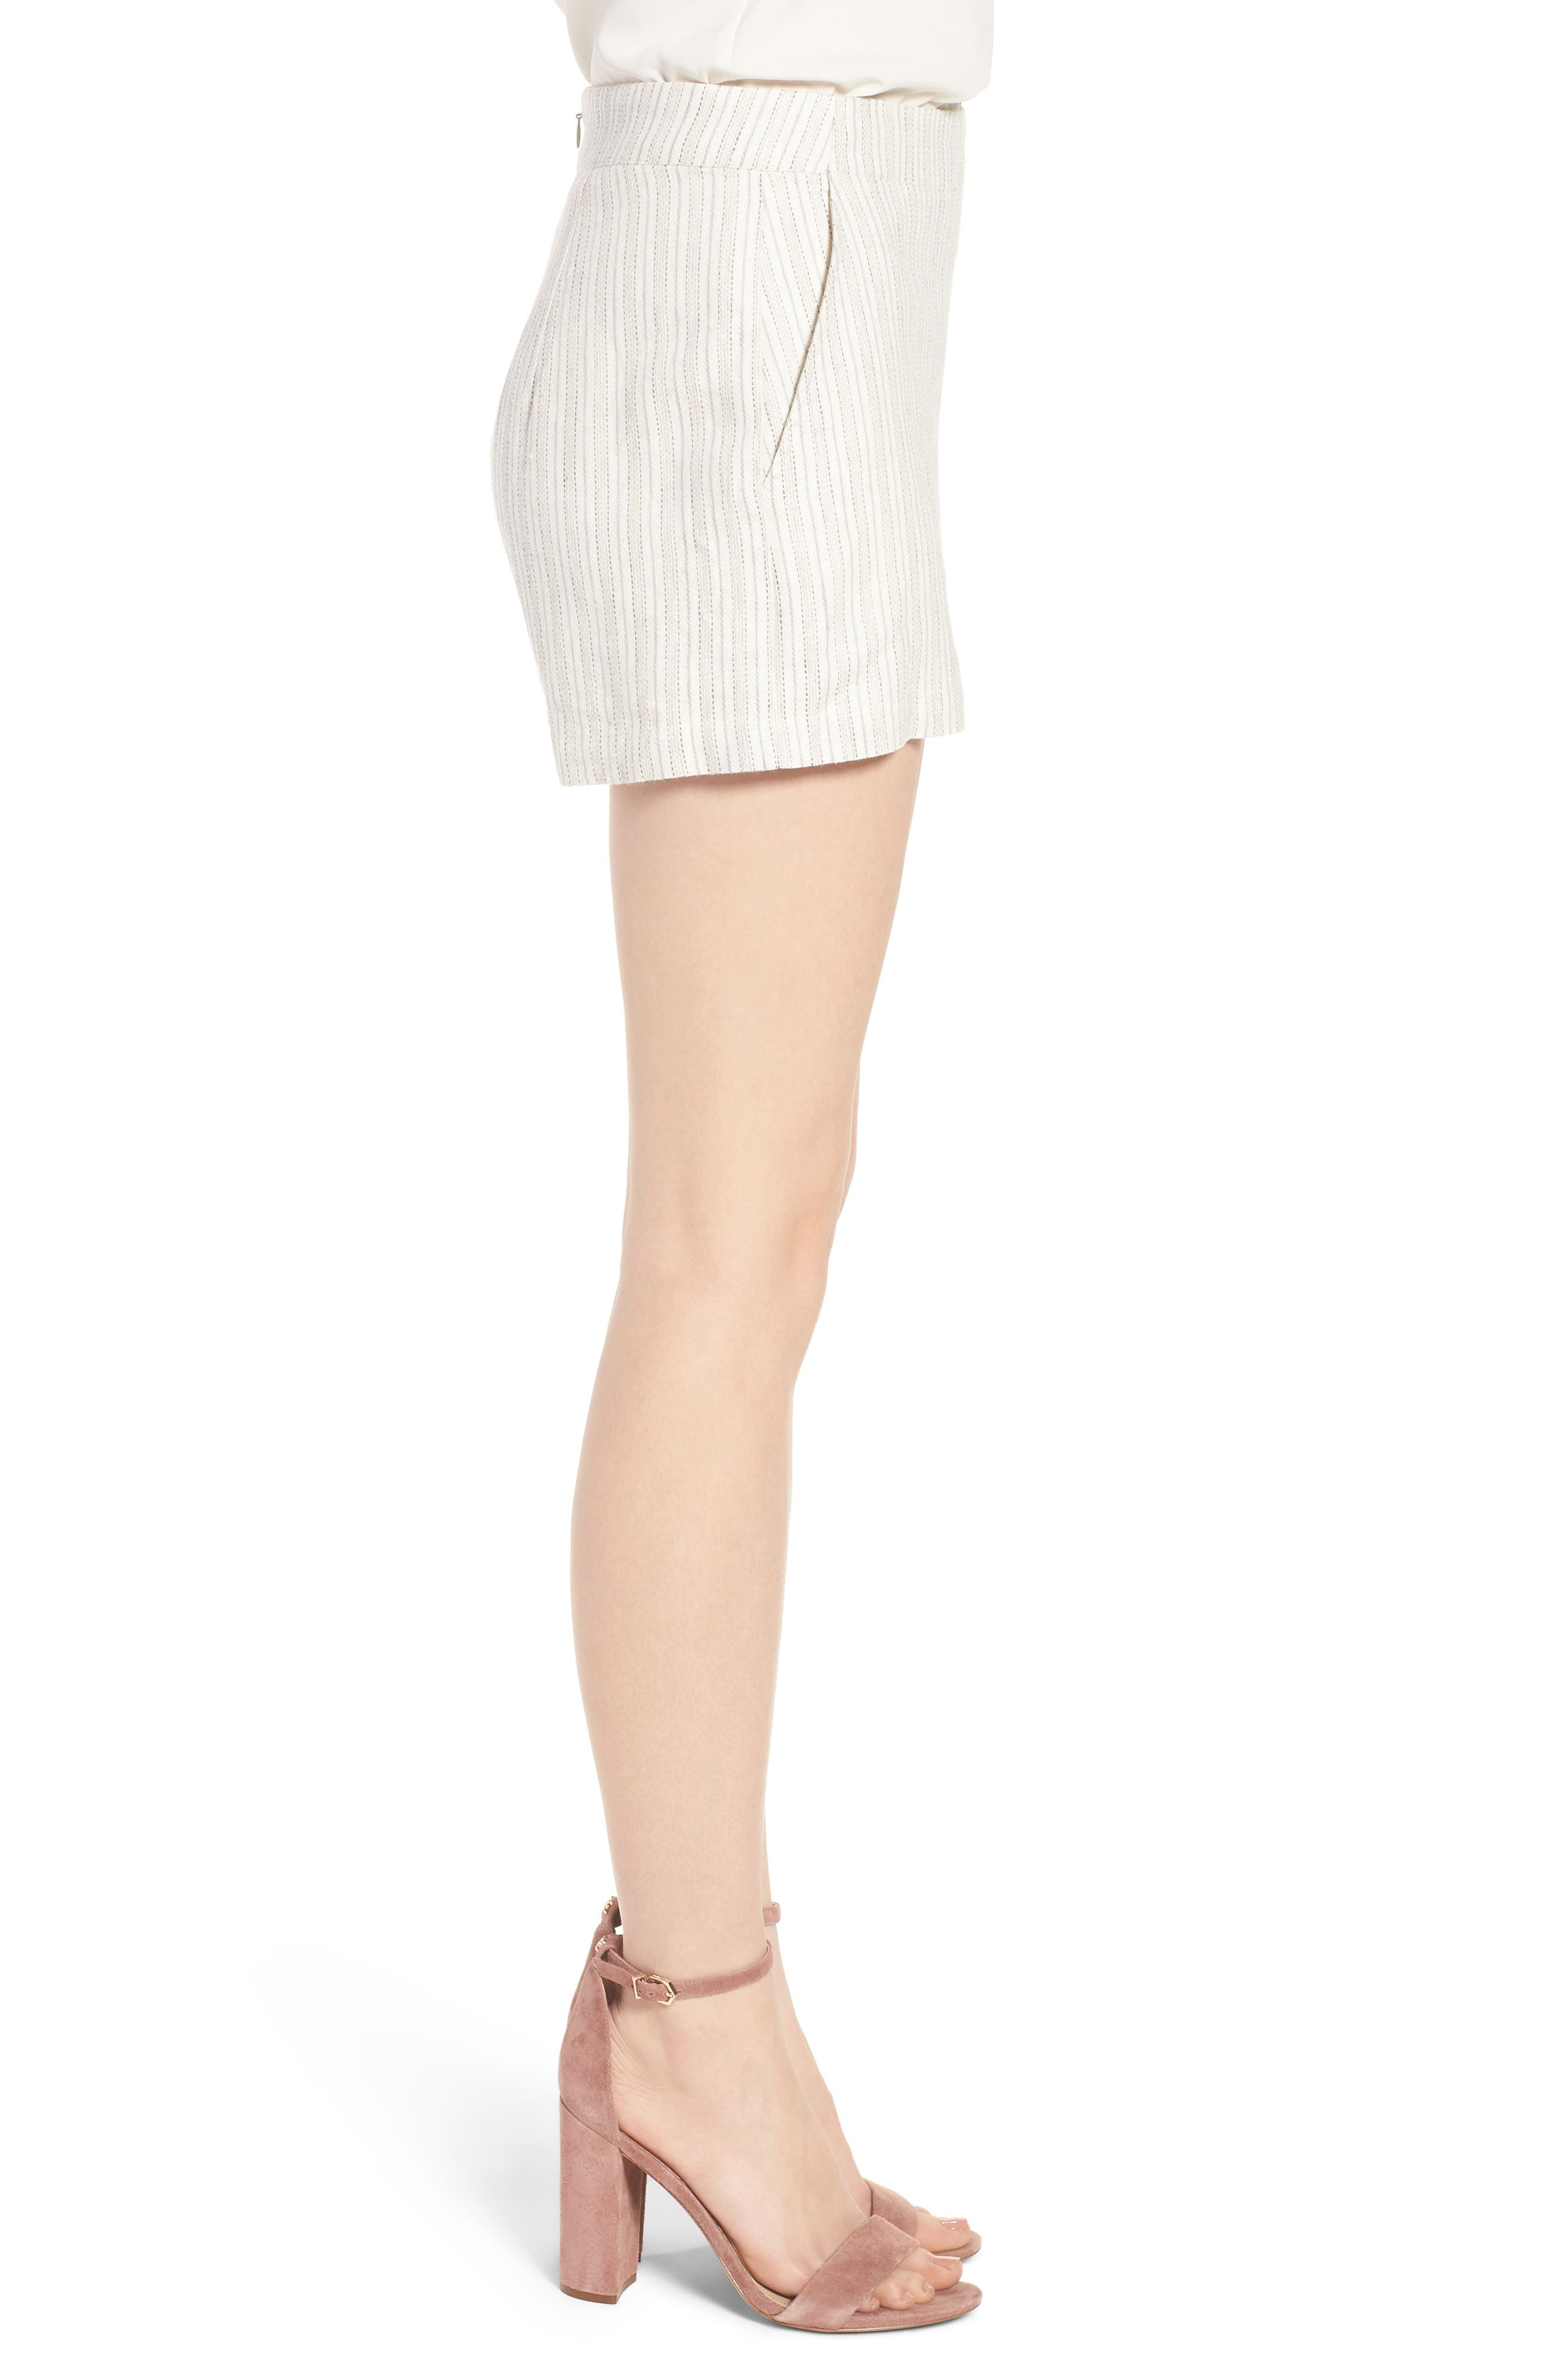 Alta Shorts,                             Alternate thumbnail 4, color,                             Ivory